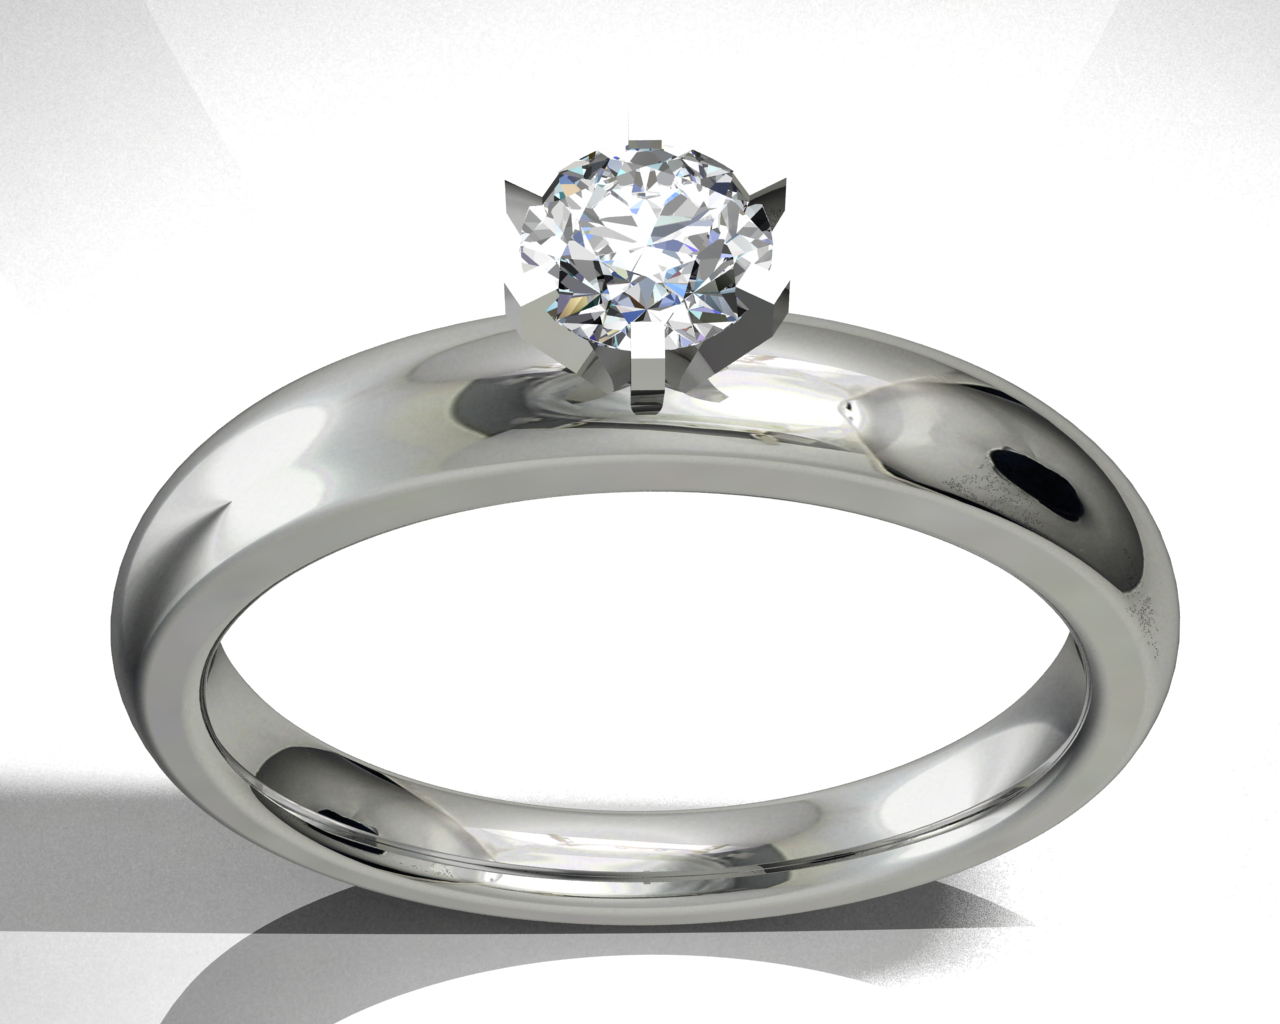 Jewelry Ring 1